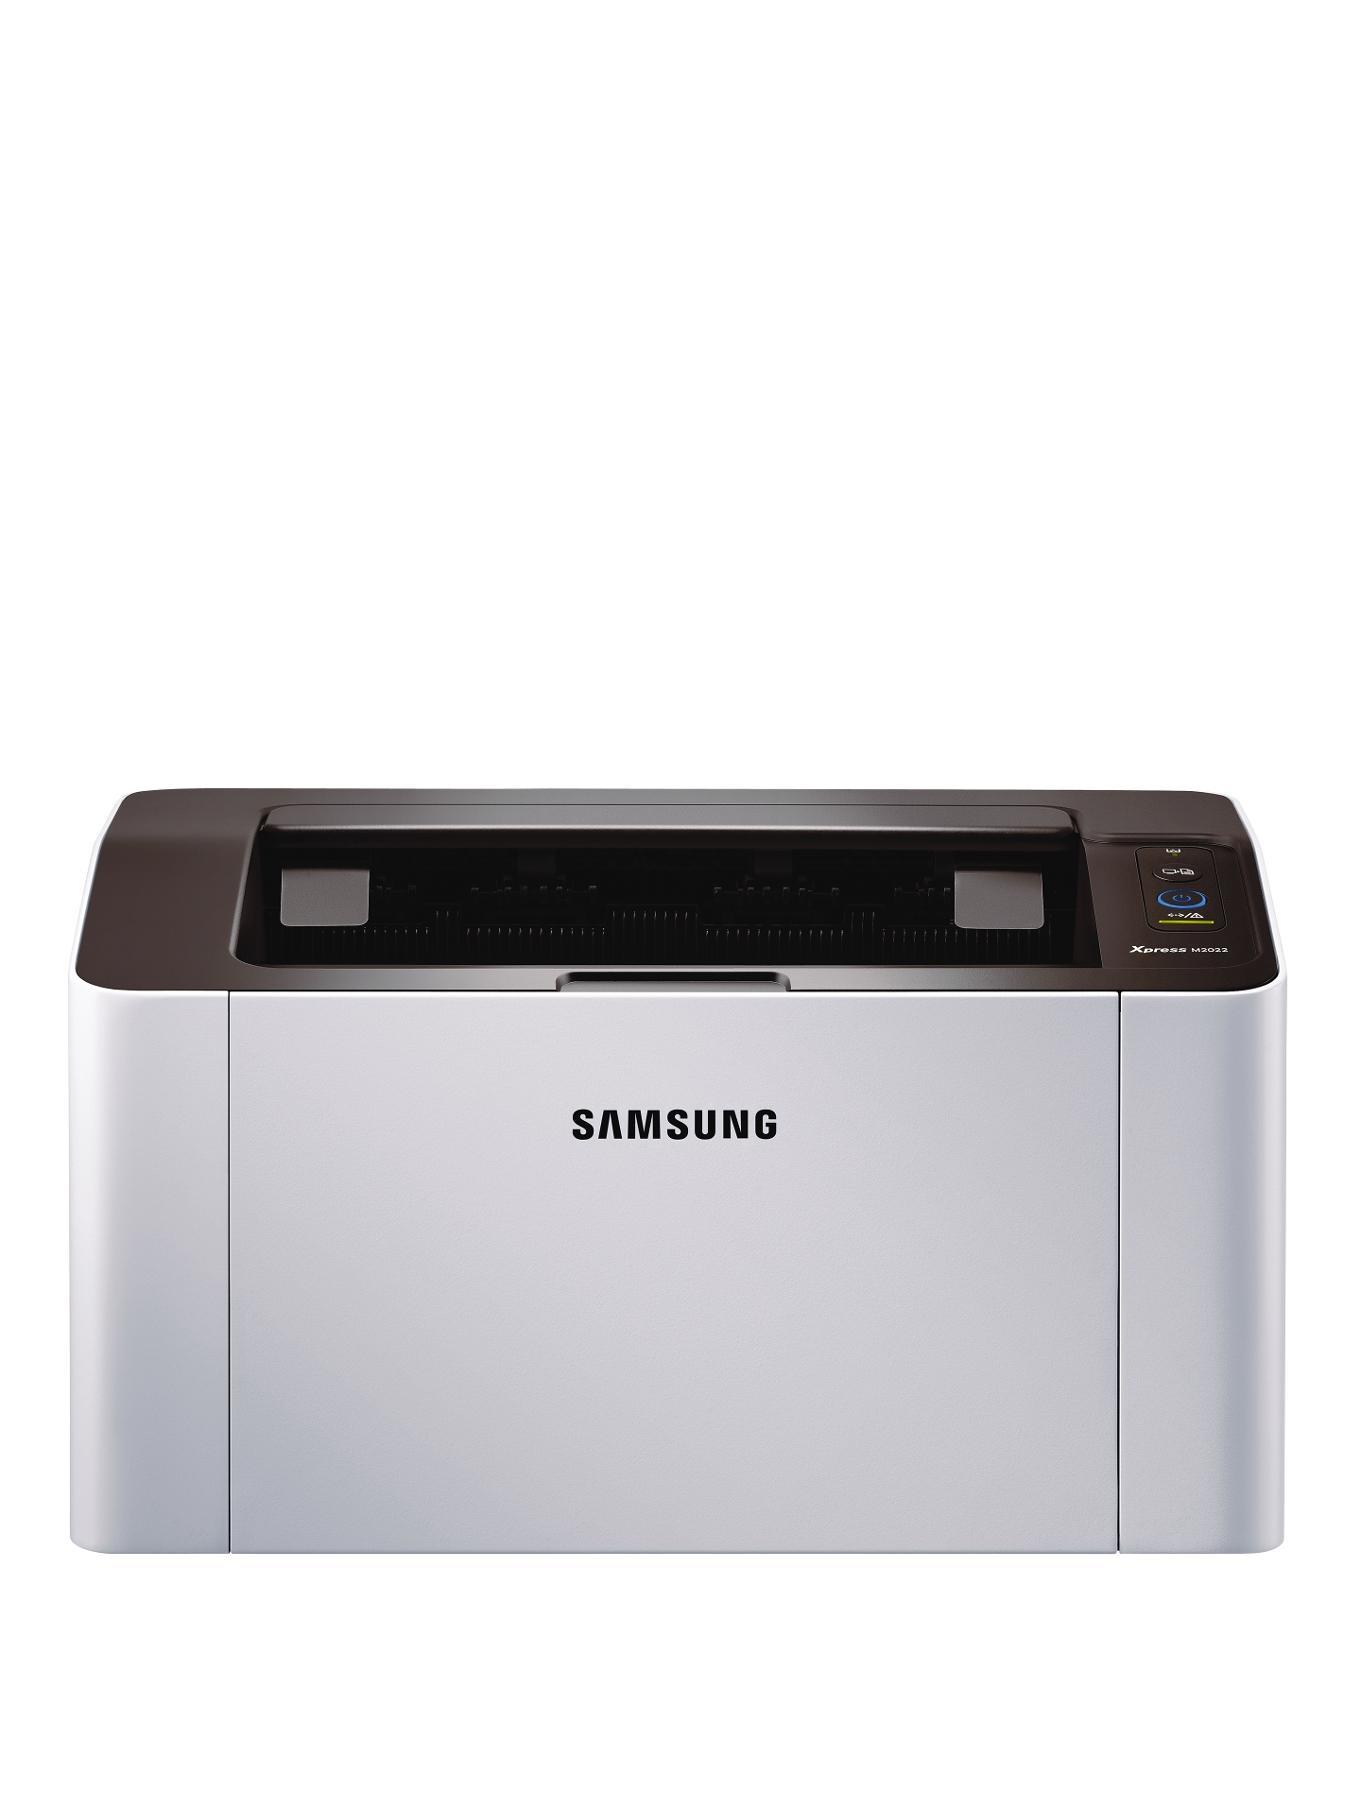 Samsung SL-M2022/XEU Mono Laser Printer Xpress